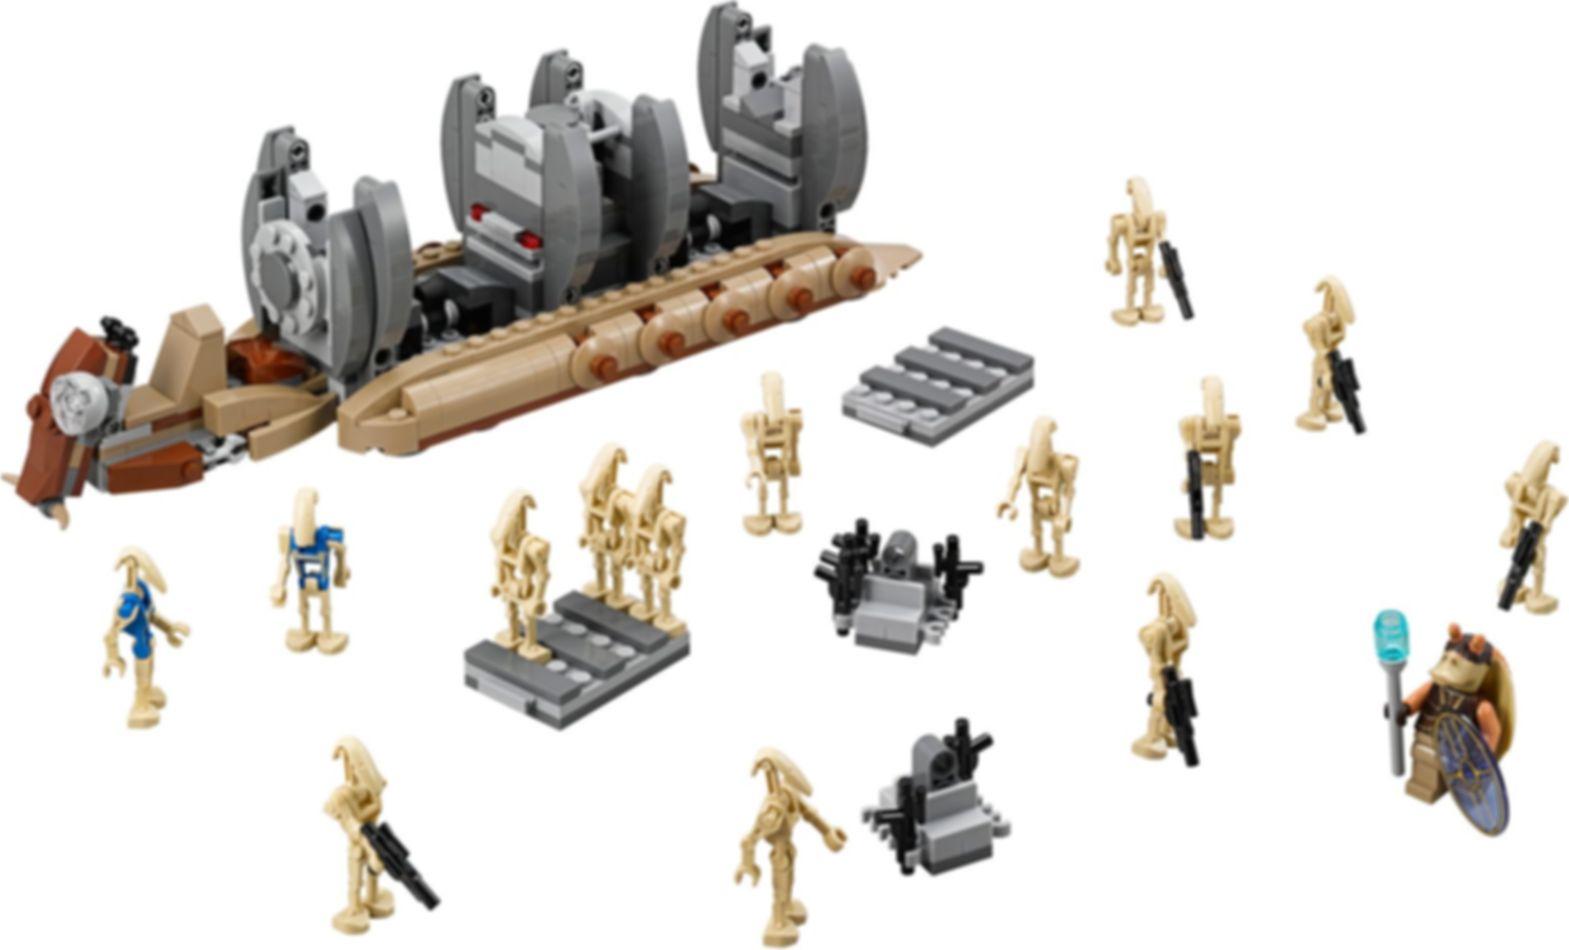 LEGO® Star Wars Battle Droid™ Troop Carrier components